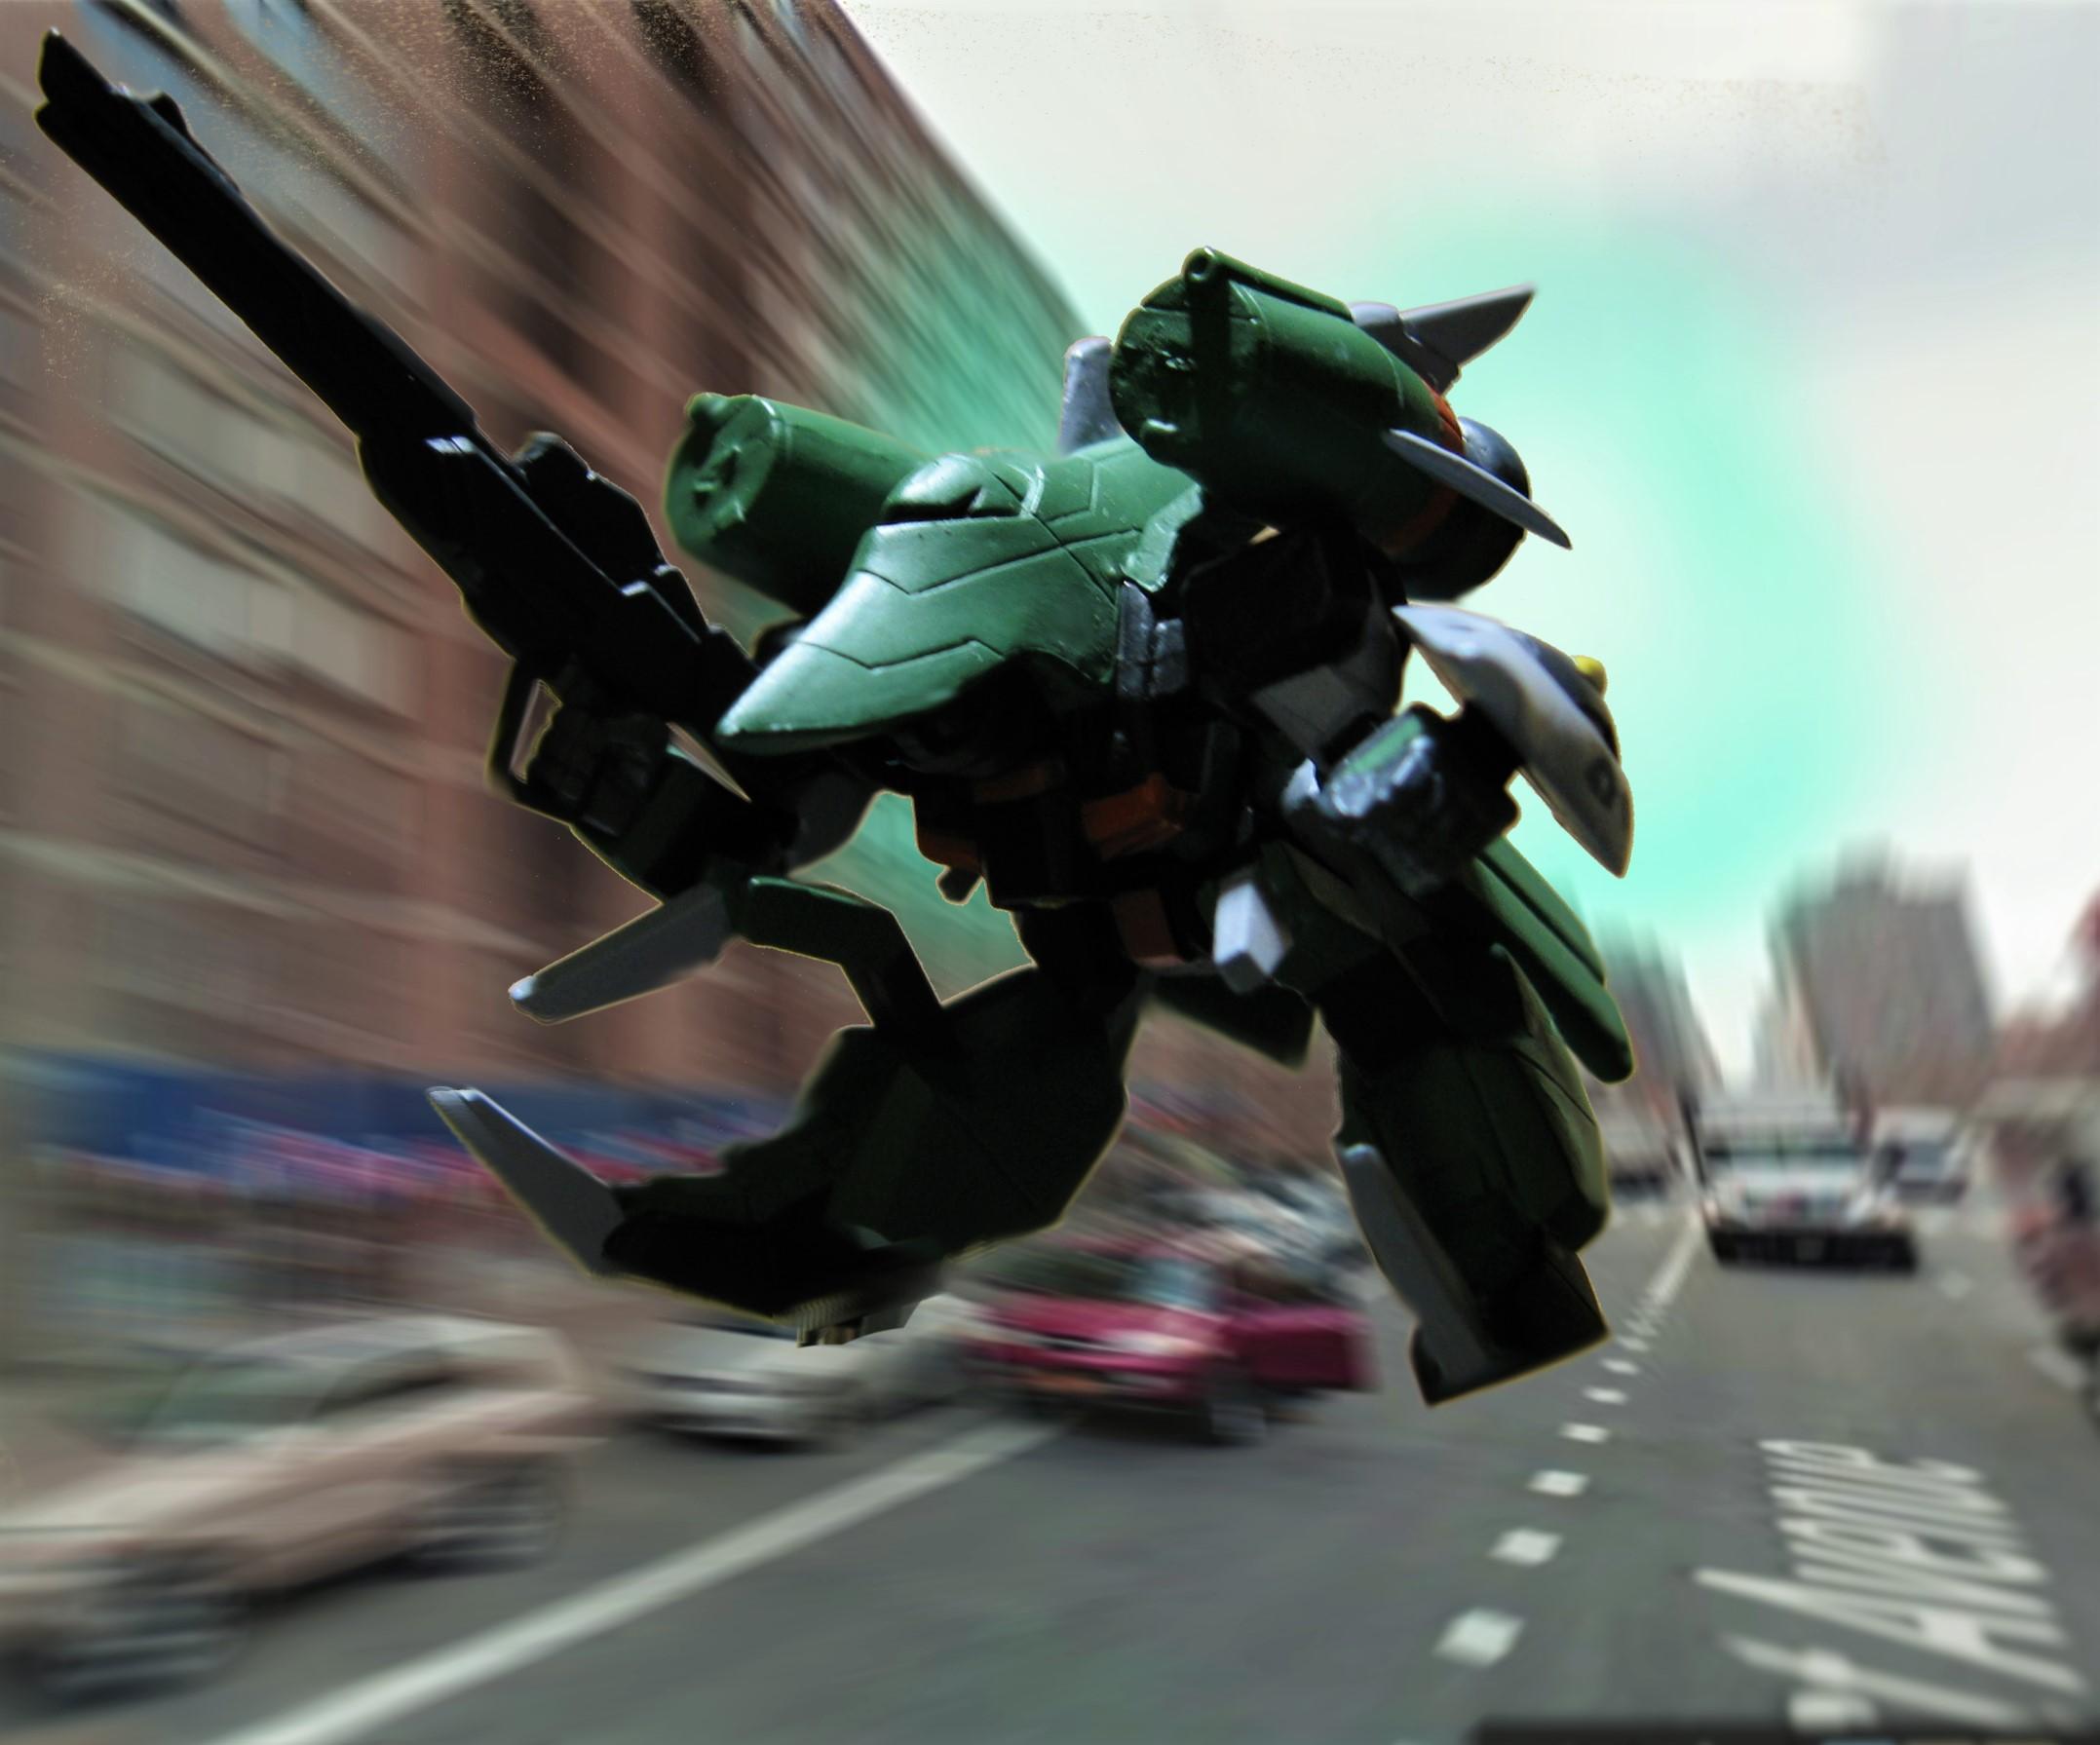 ZGMF-X24S カオスガンダム デジラマ Chaos Gundam Gジェネ ジェネレーション 戦争 マンハッタン モンスター